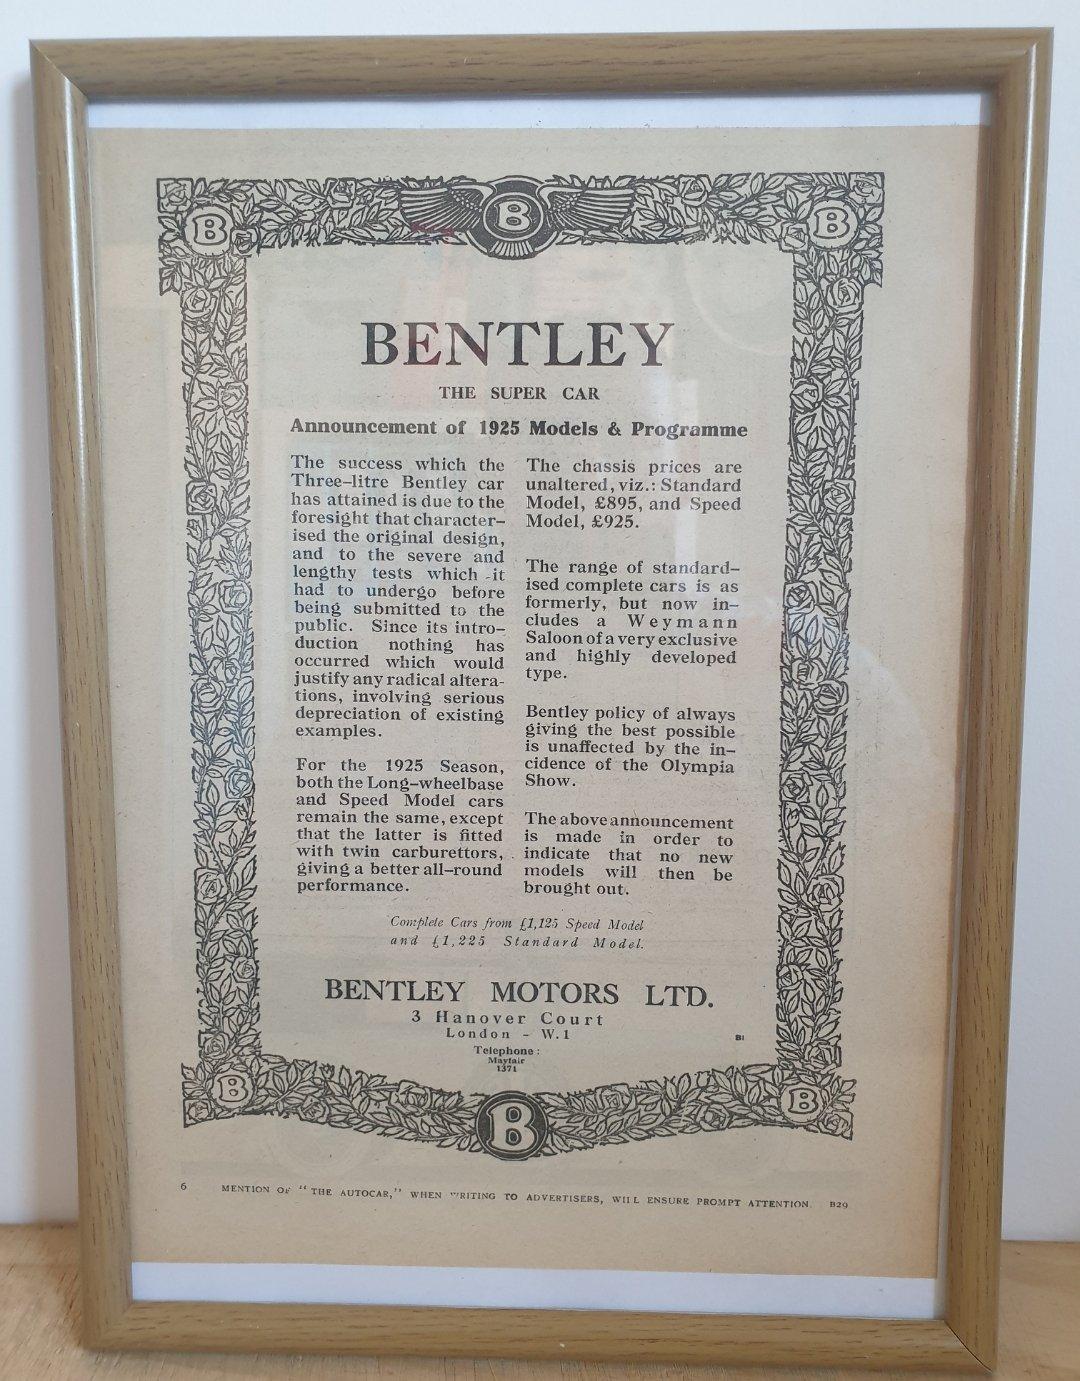 1970 Original 1924 Bentley Framed Advert  For Sale (picture 1 of 2)